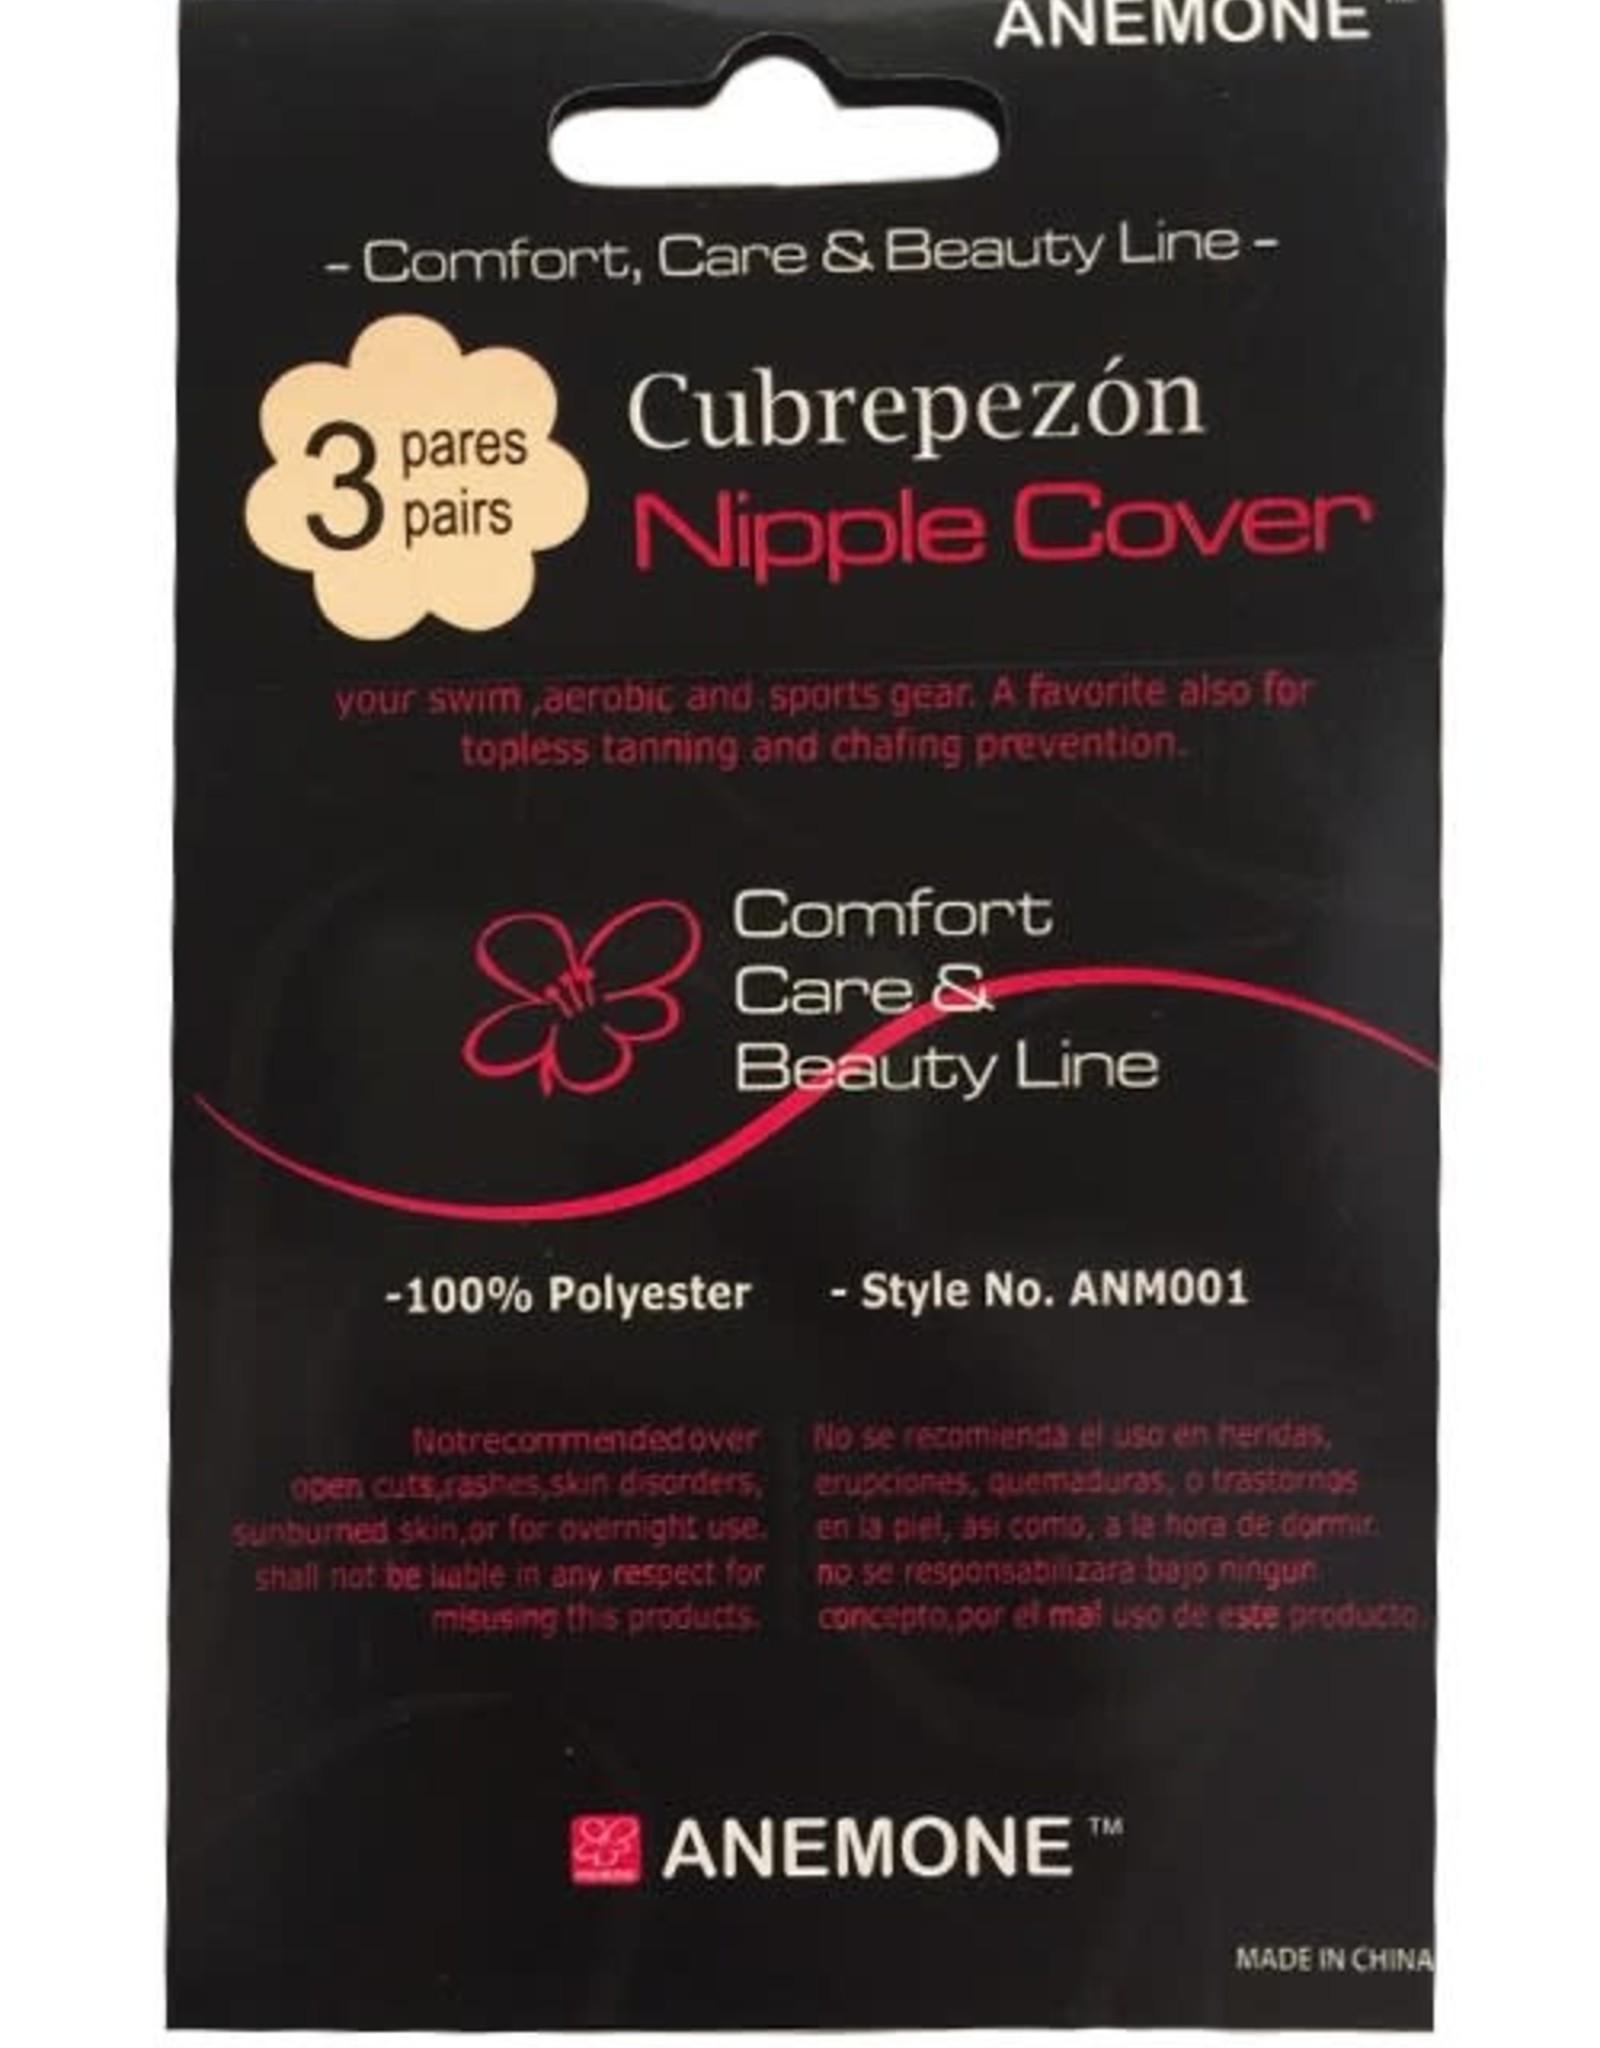 Anemone Adhesive nipple cover petals